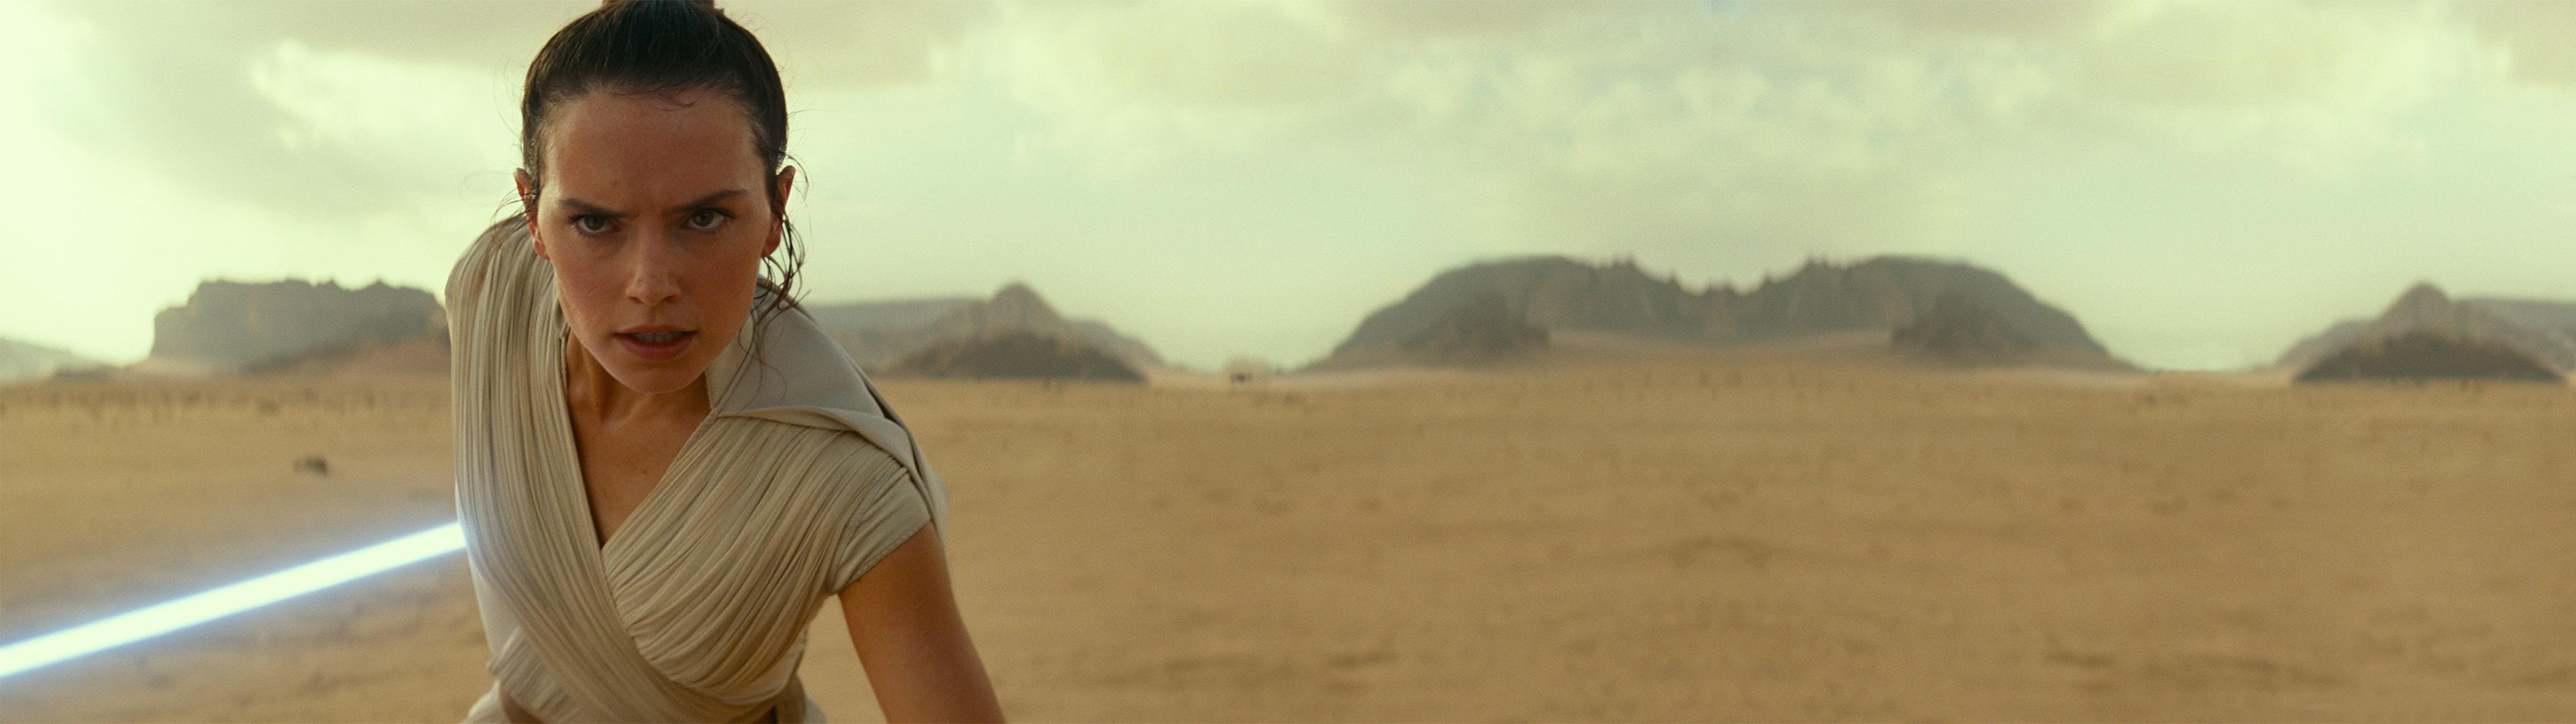 Rey Rey From Star Wars Star Wars Dual Display Dual Monitors